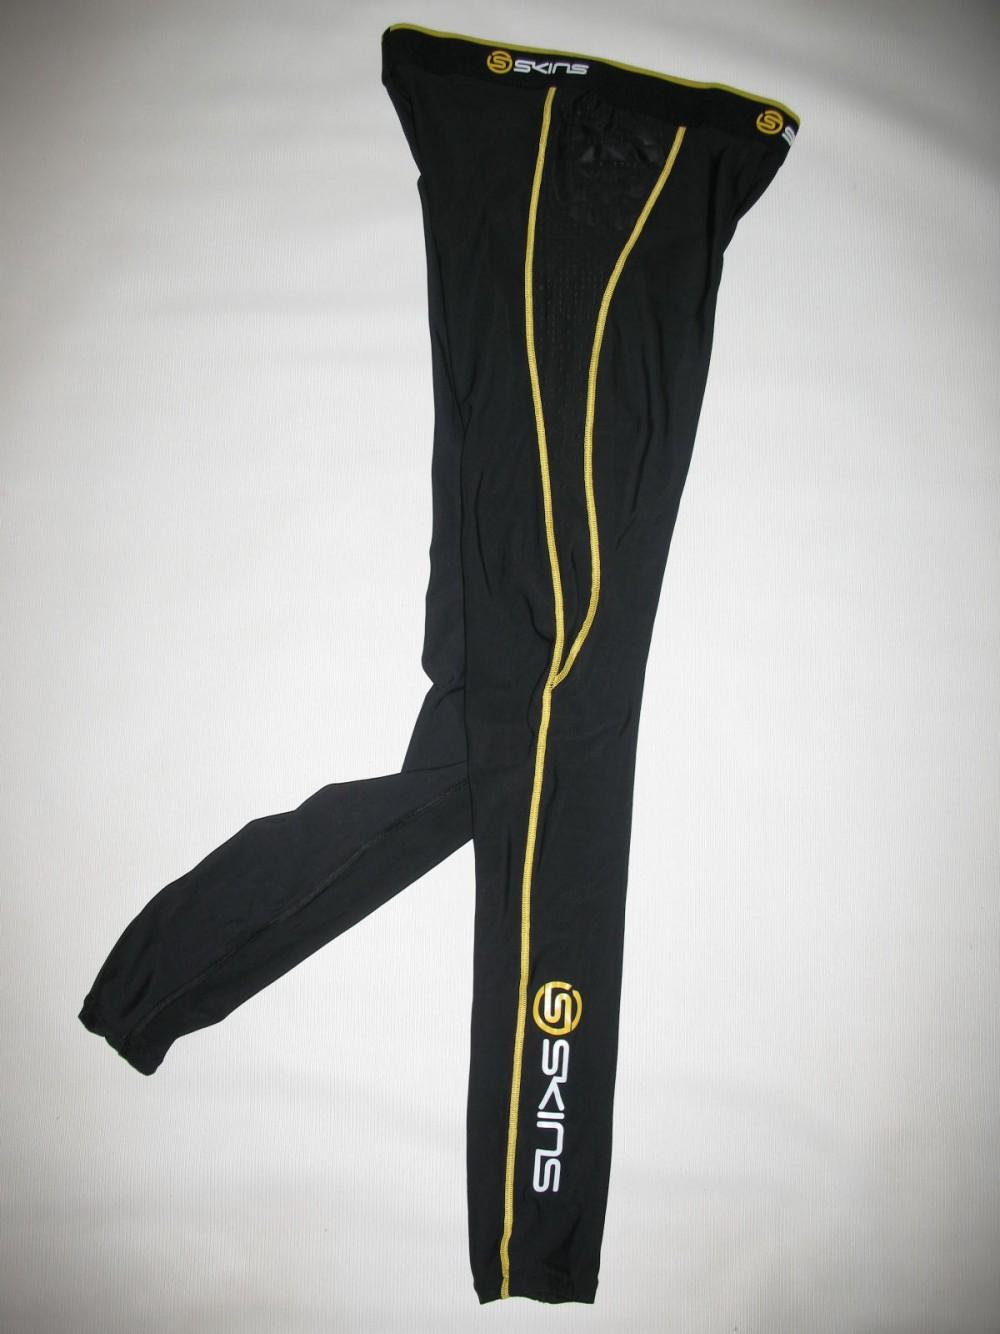 Футболка+брюки SKINS A200  short sleeves jersey+ long tights (размер M) - 3